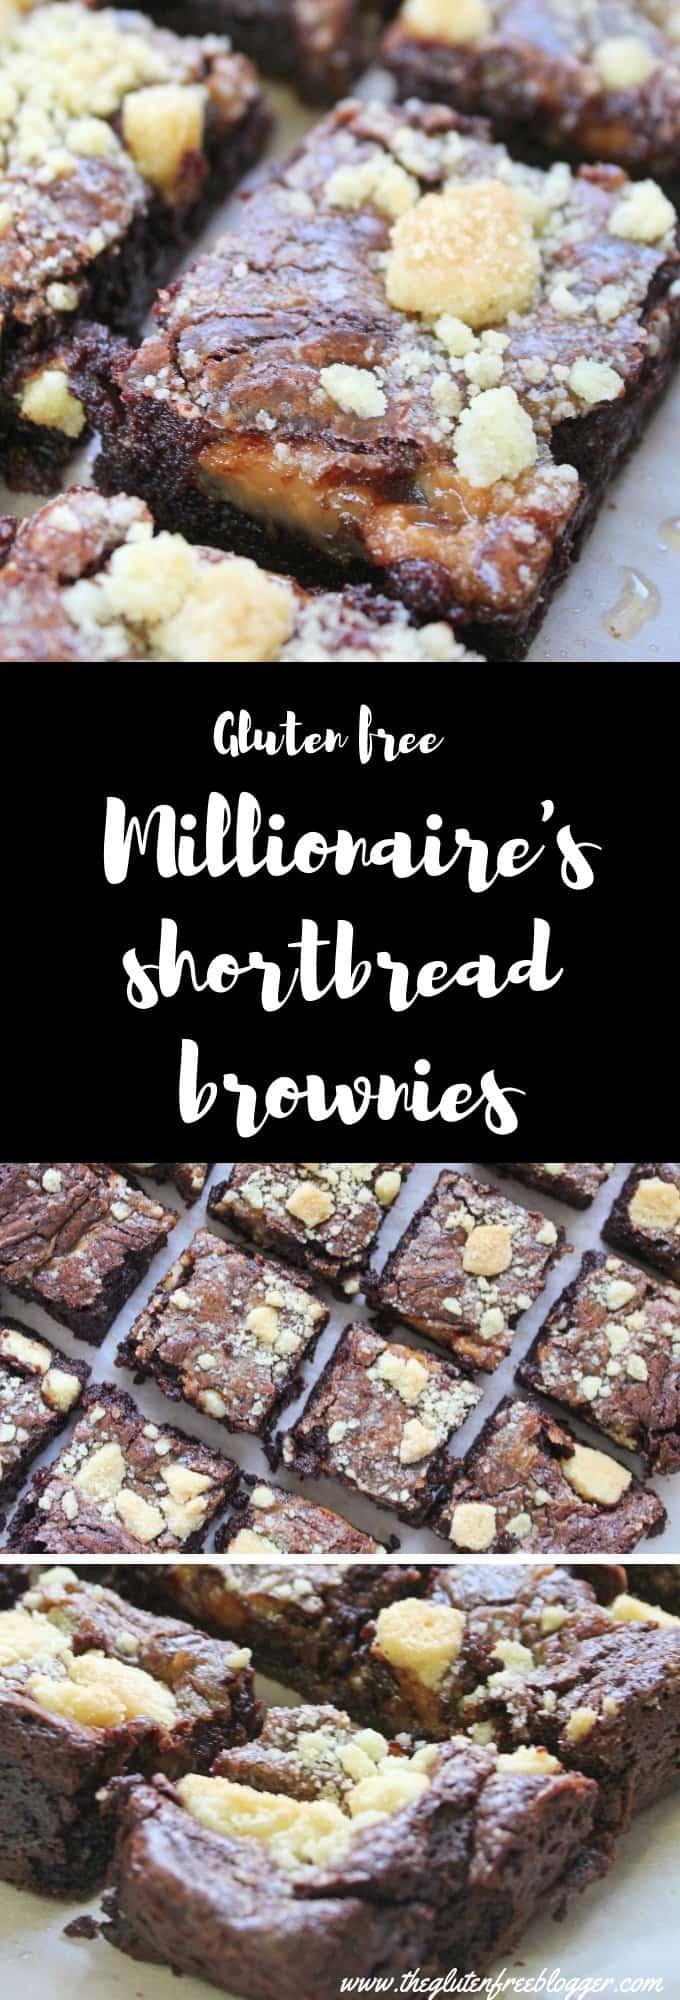 gluten free millionaire's shortbread brownies recipe - desserts - coeliac - easy fudgy brownies